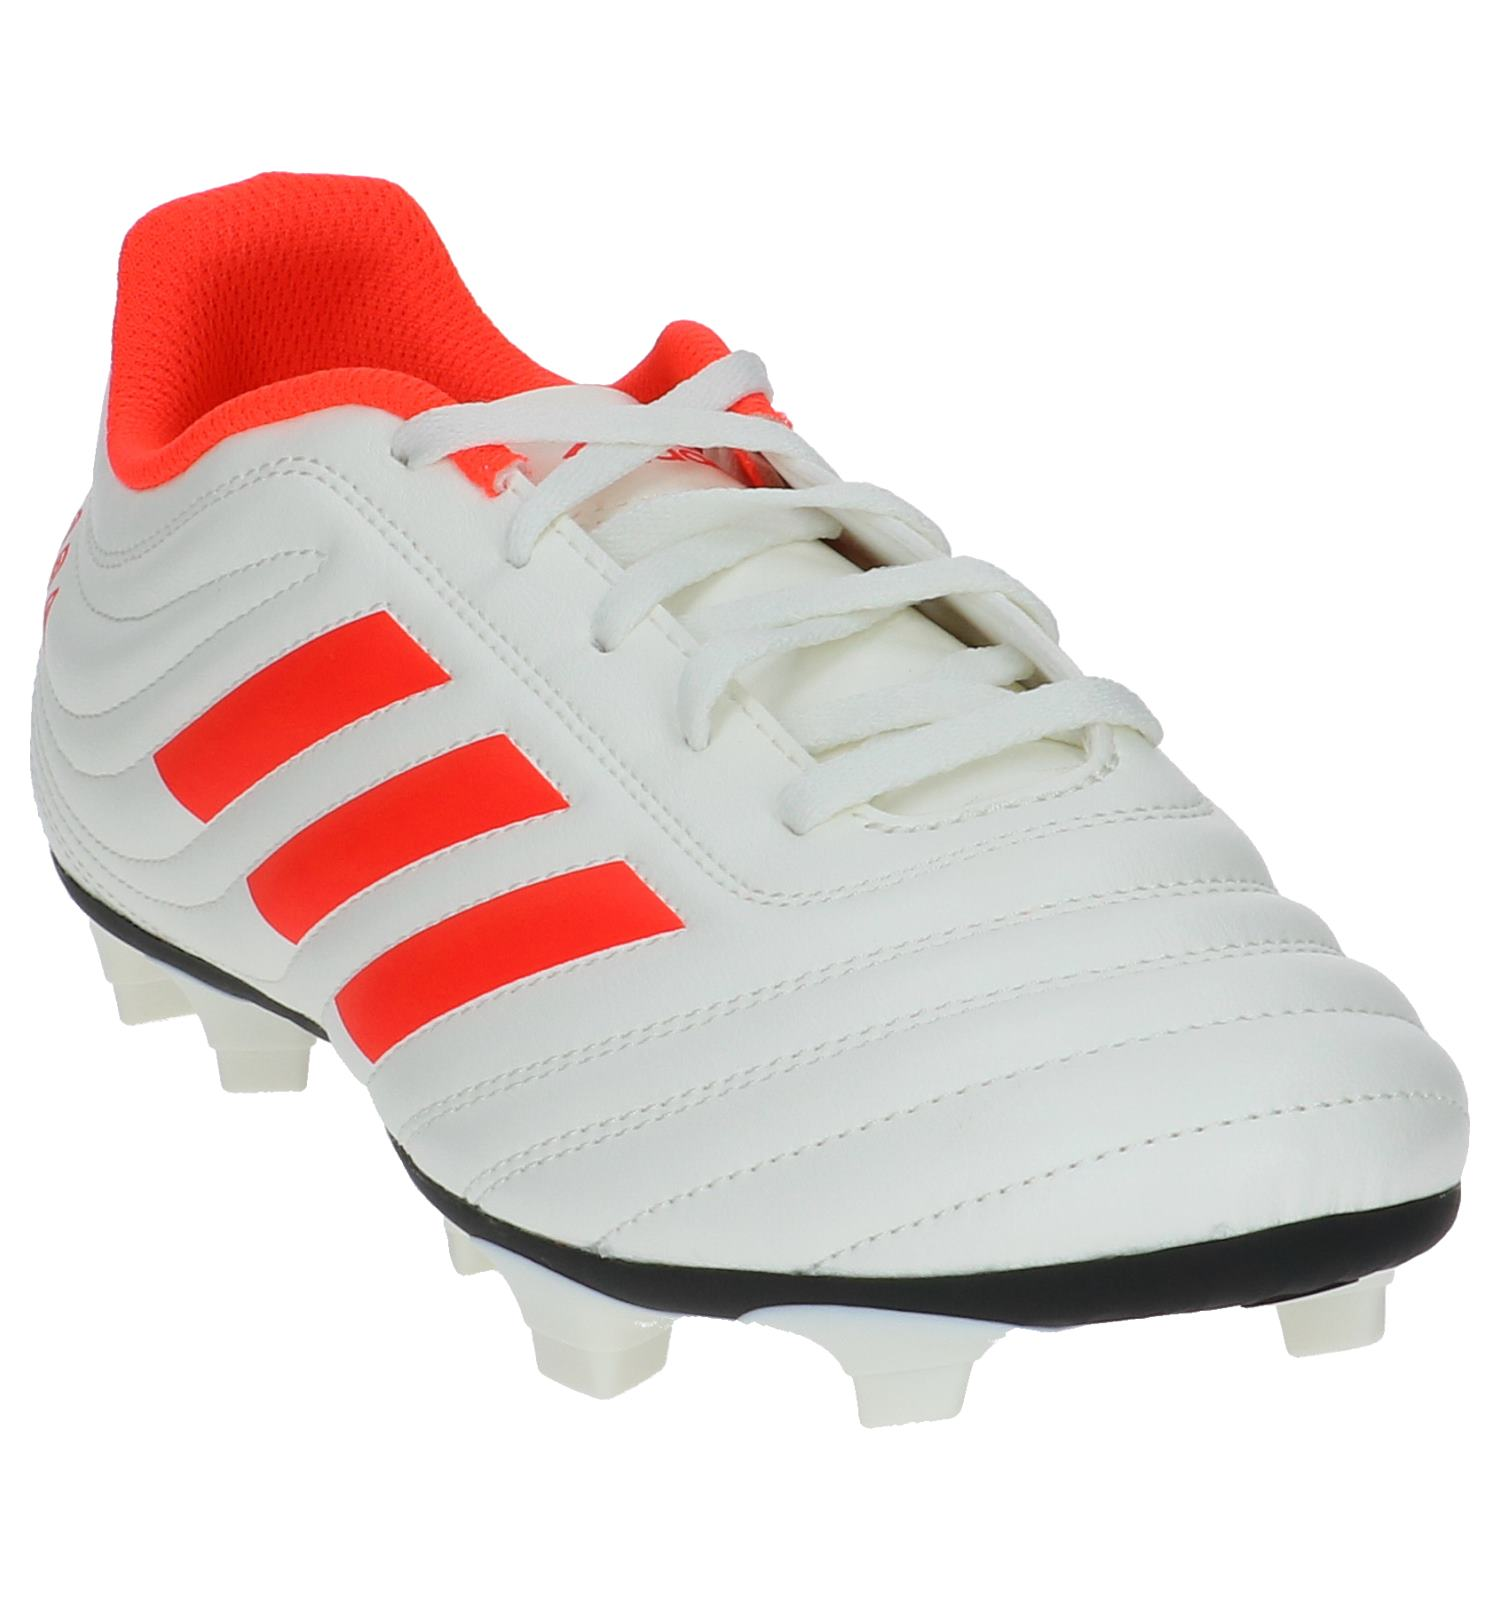 9ff28323f48 Voetbalschoenen adidas Copa 19.4 FG Ecru/Oranje | TORFS.BE | Gratis verzend  en retour